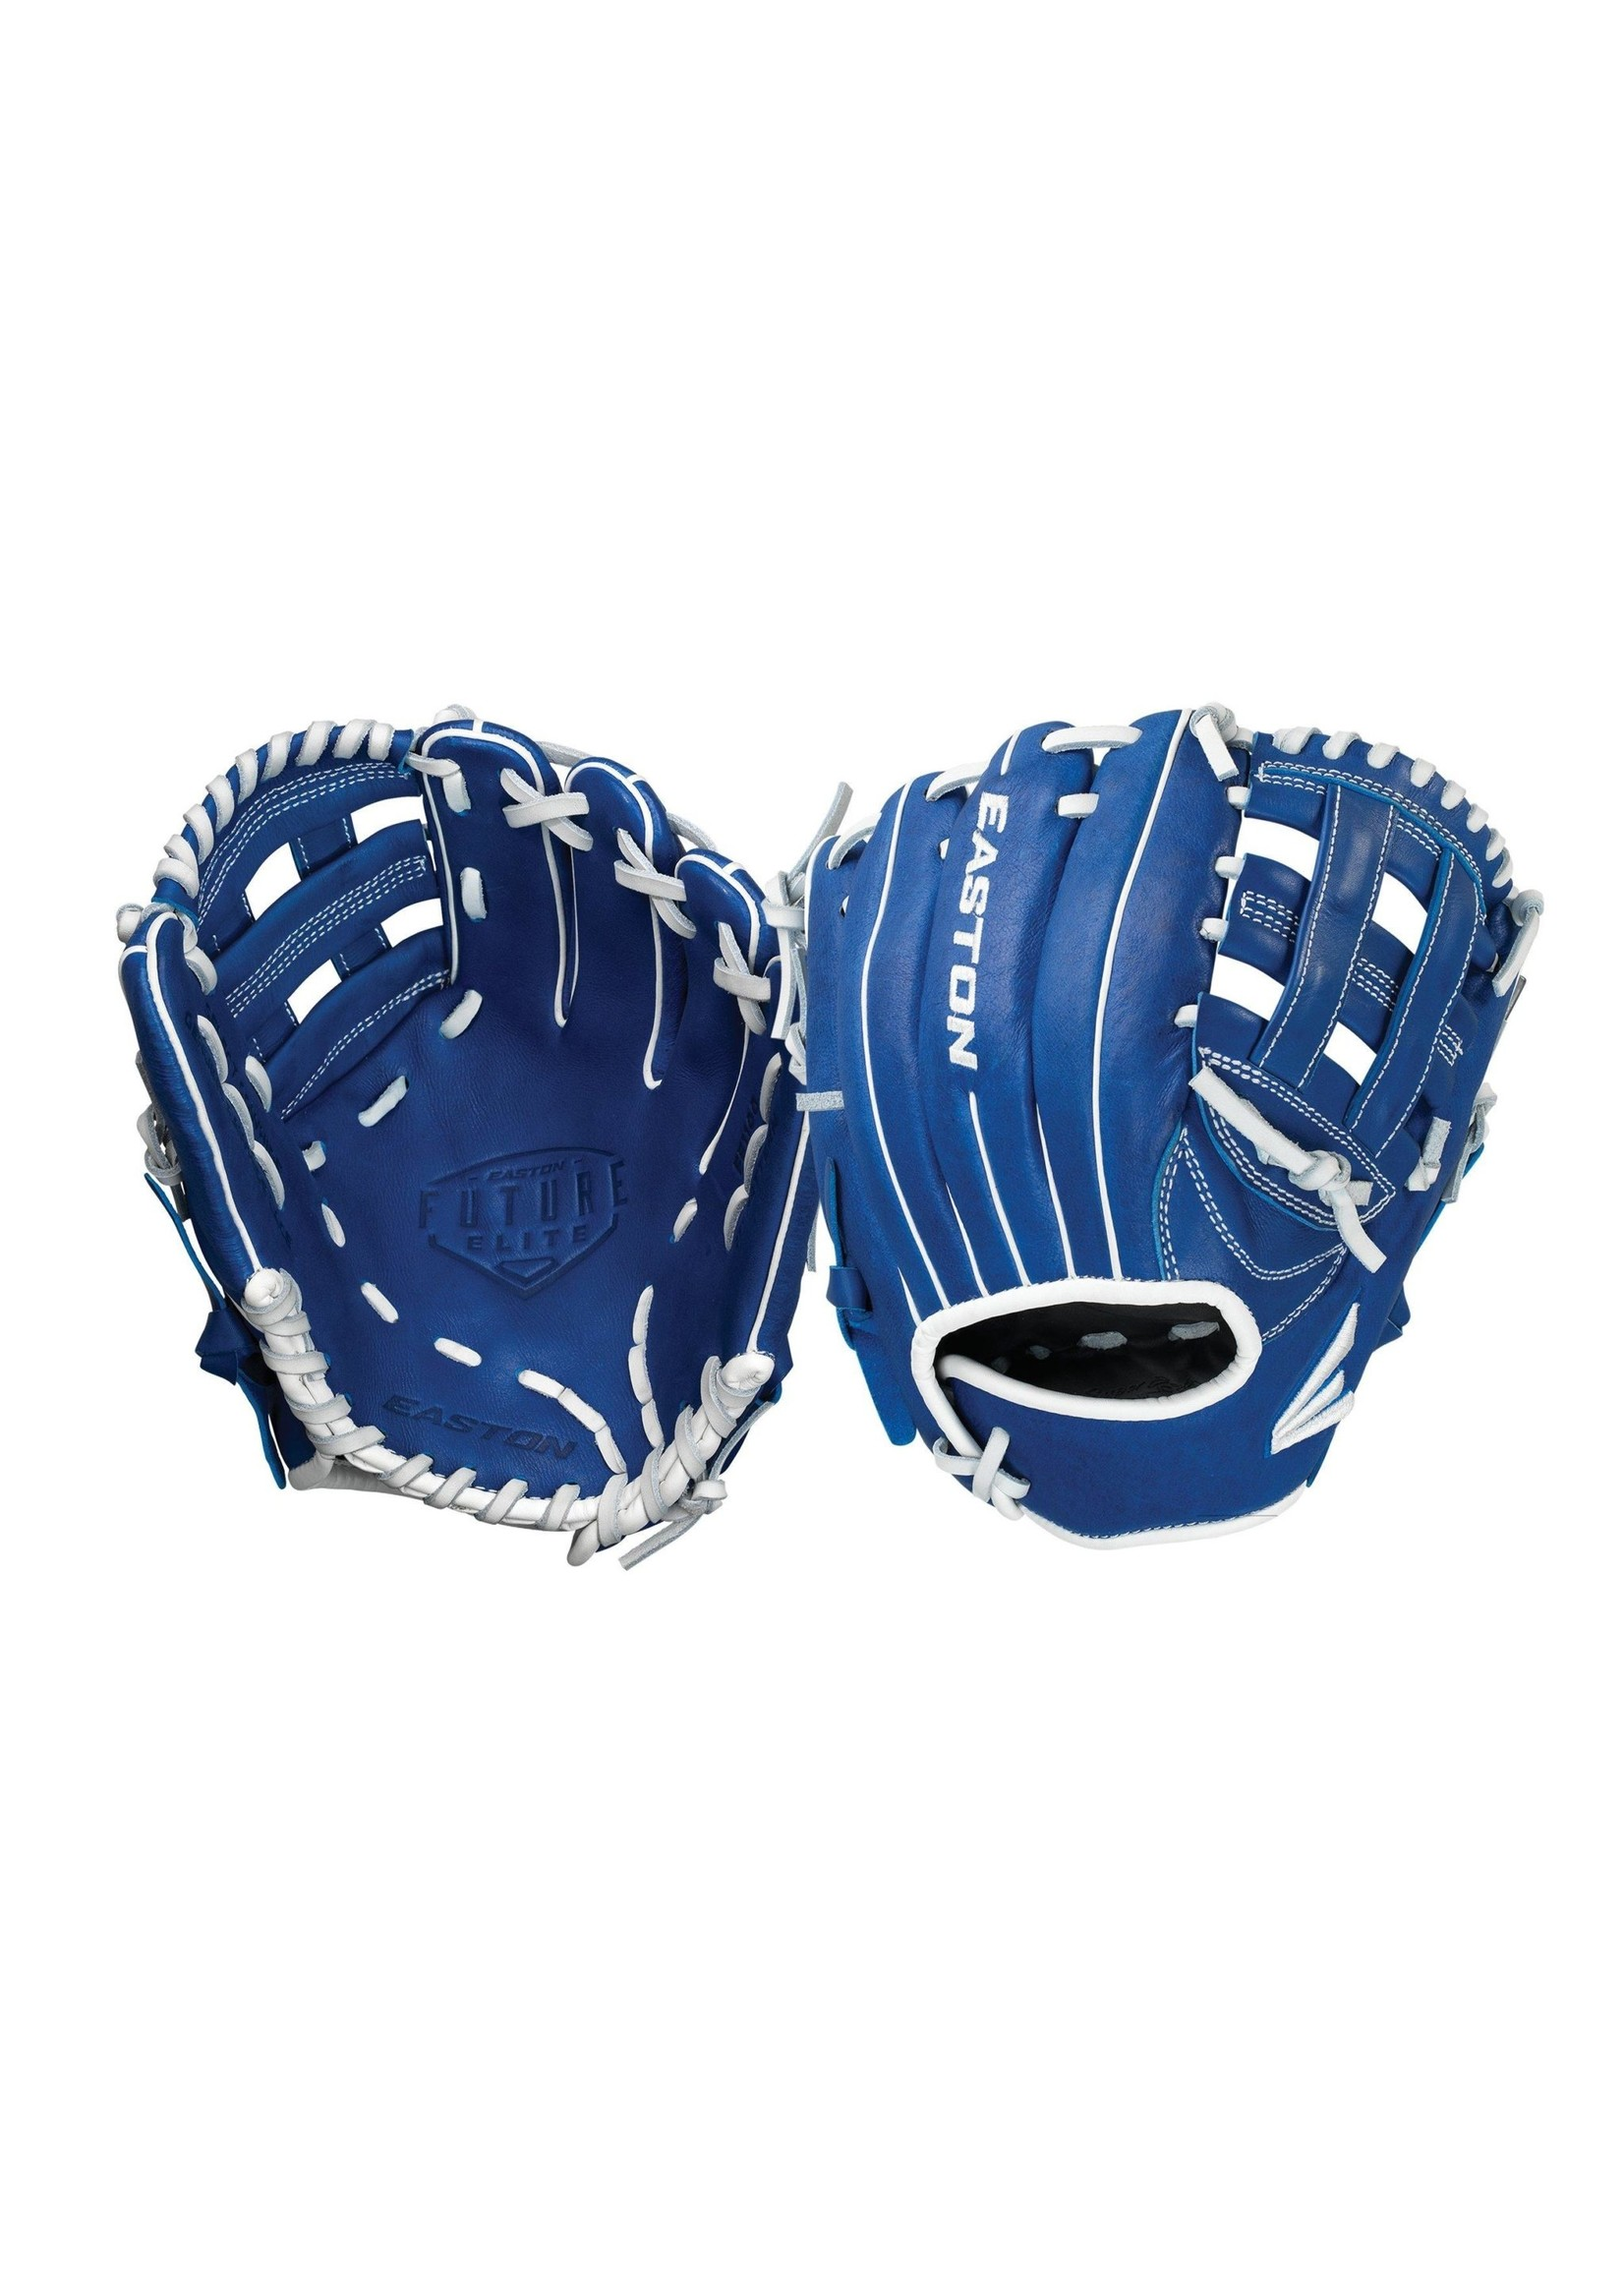 Easton Baseball (Canada) EASTON FUTURE ELITE 11'' BLUE YTH BASEBALL GLOVE